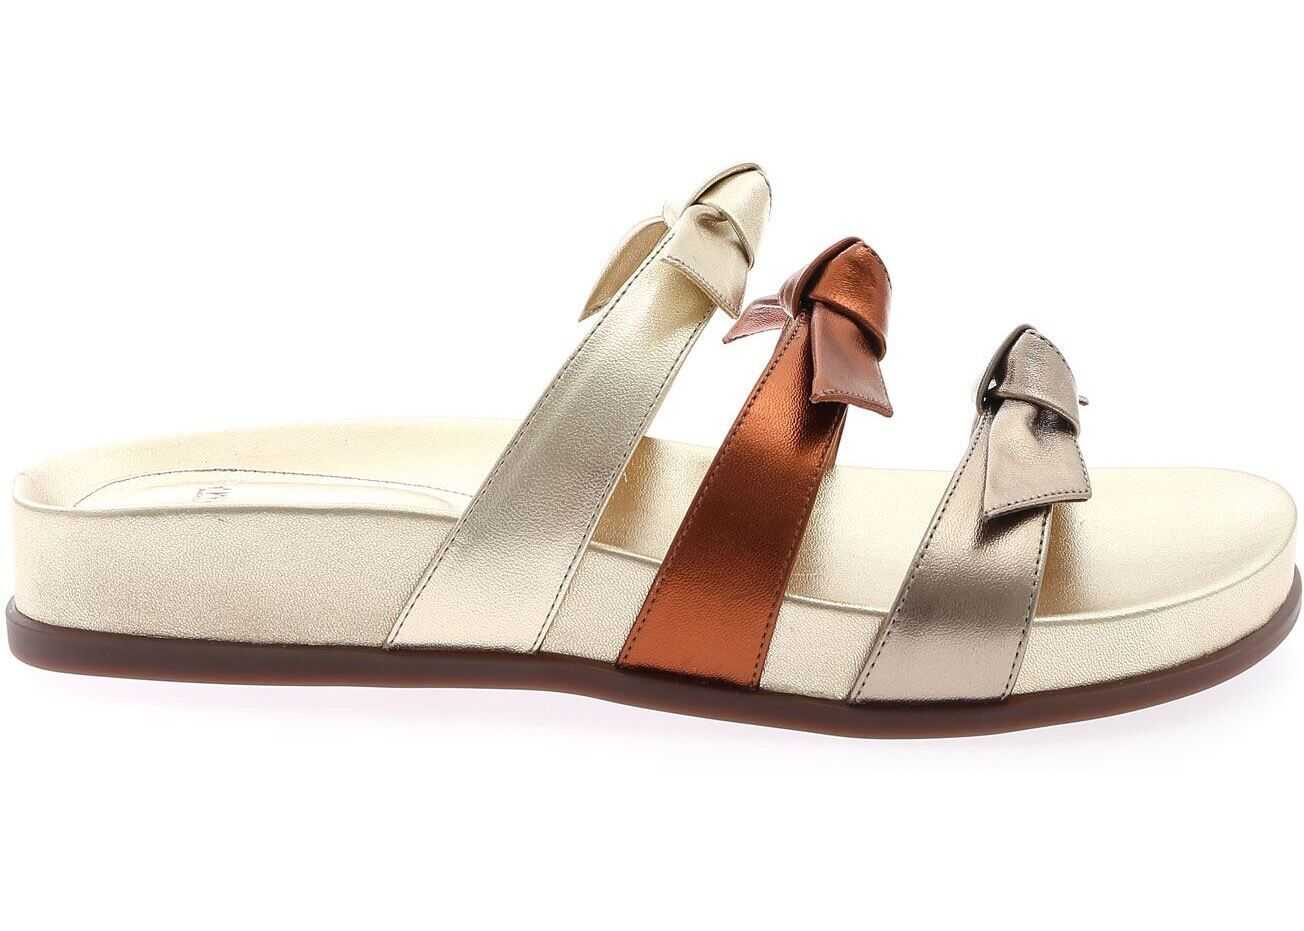 Alexandre Birman Lolita Slippers In Metallic Nappa Leather Gold